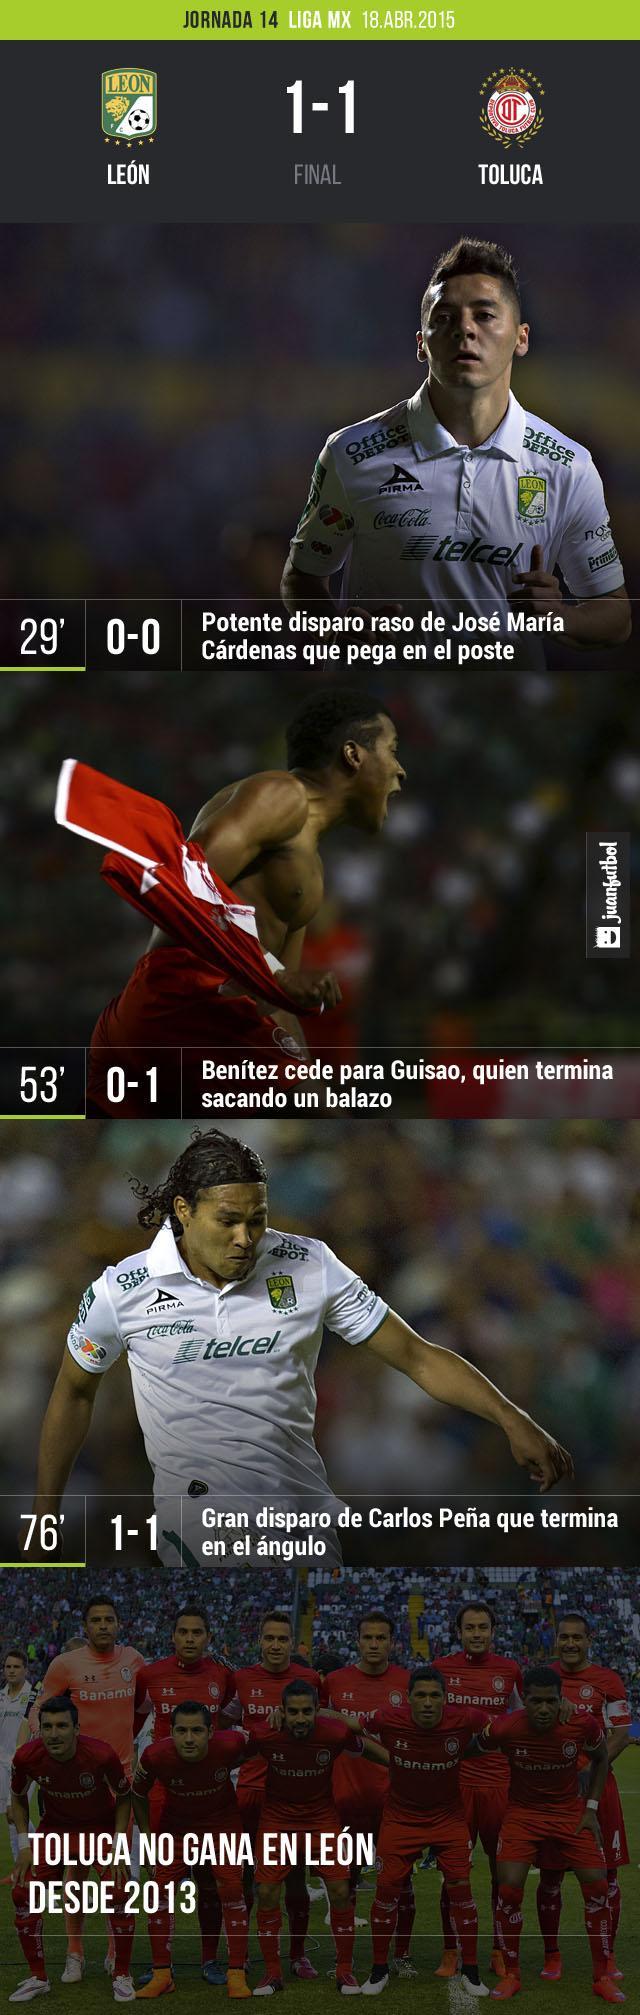 Toluca y Léon empataron a un gol enla jornada 14 del Clausura 2015.